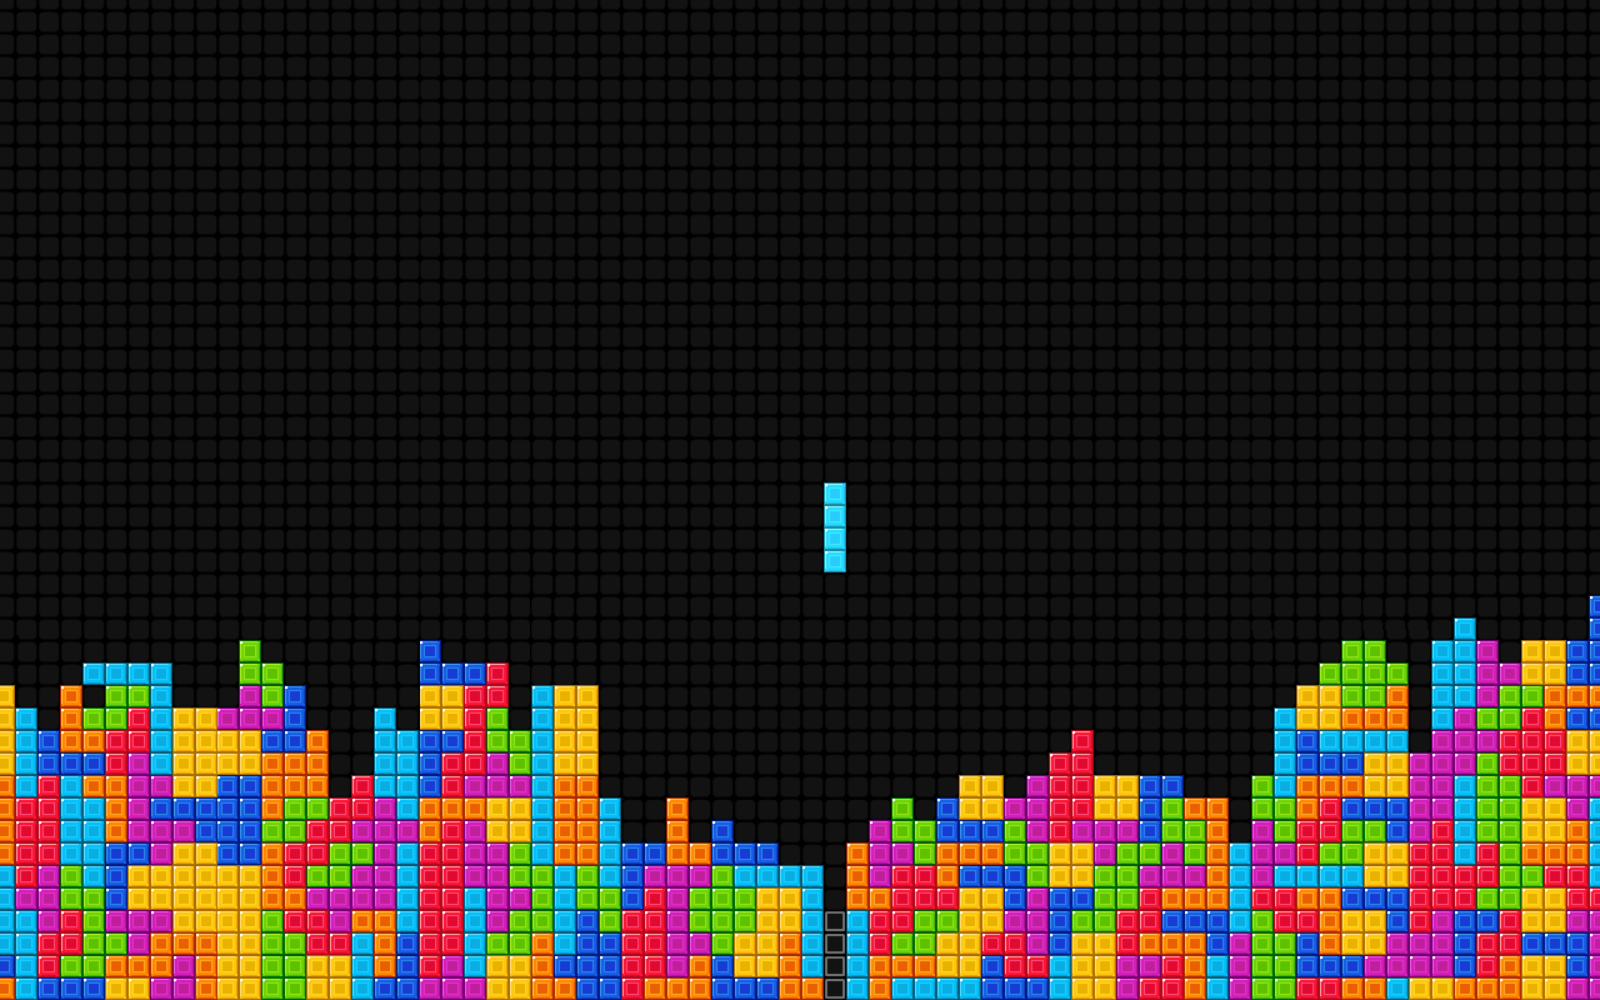 http://2.bp.blogspot.com/-j1M1DyUMUlw/Tpb61lB2m1I/AAAAAAAADbc/b_f_03axNF4/s1600/Tetris_Colorful_Wallpaper_Vvallpaper.Net.jpg